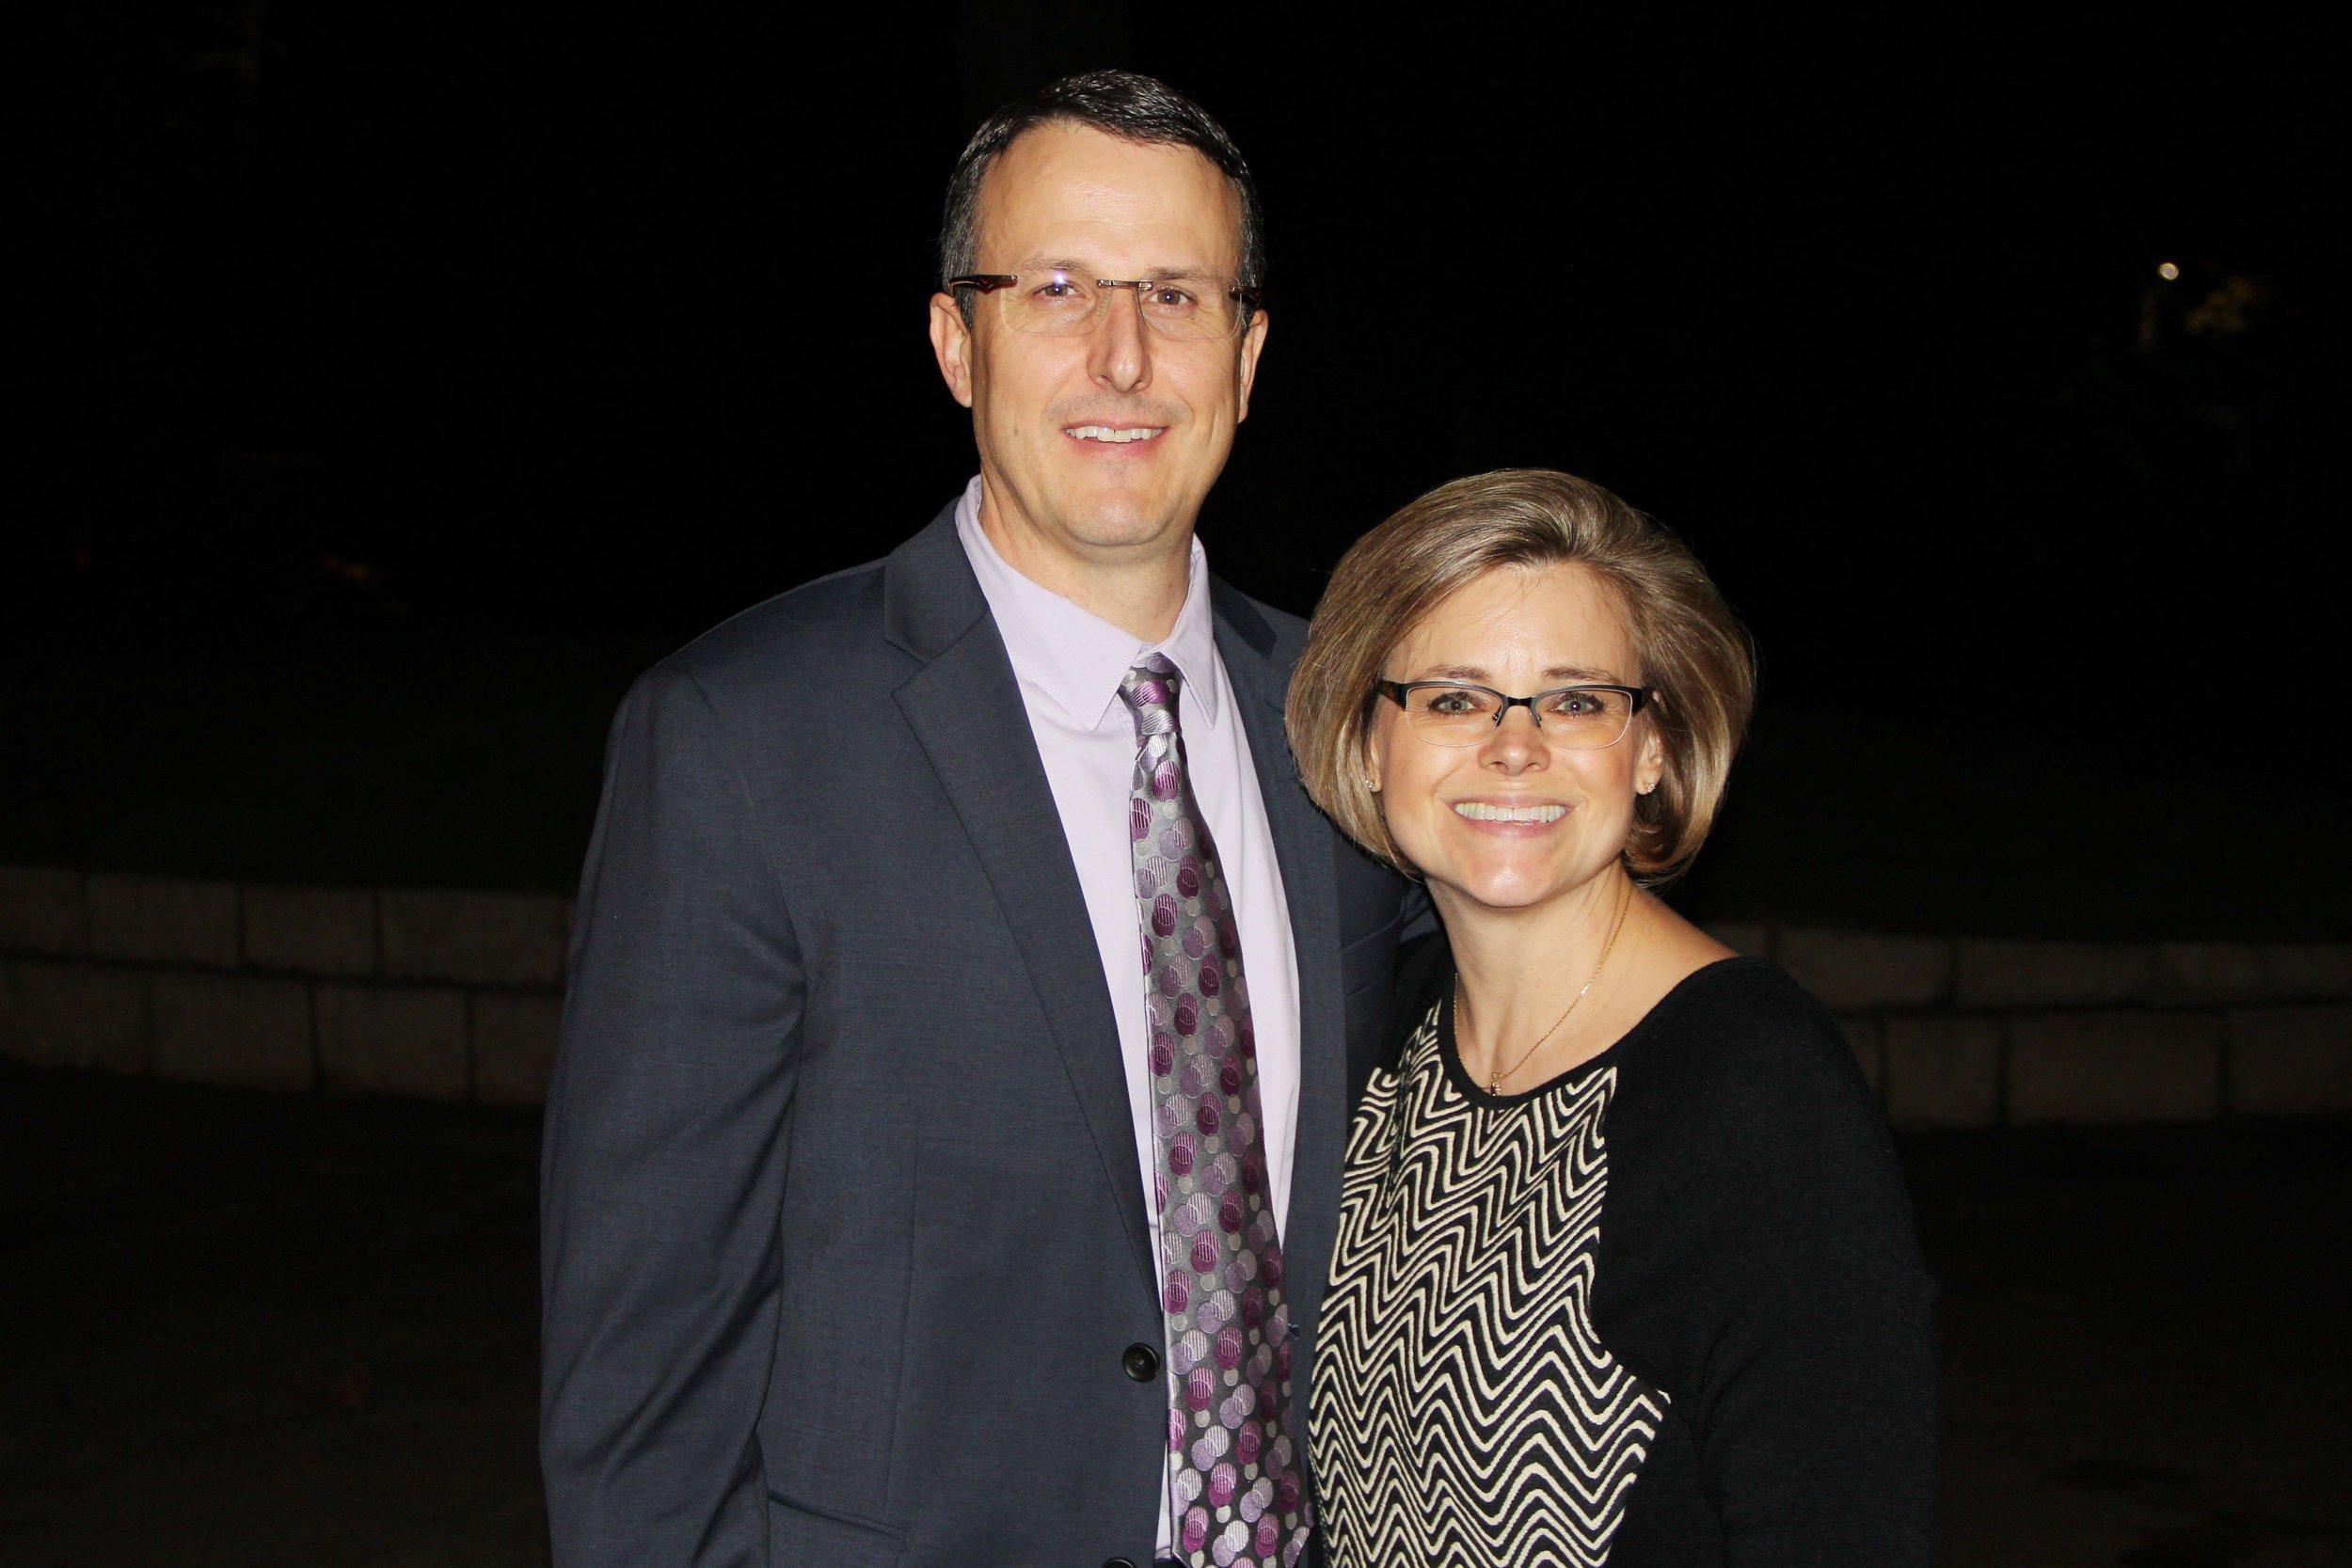 Dr. Jason and Sigrunn Yost